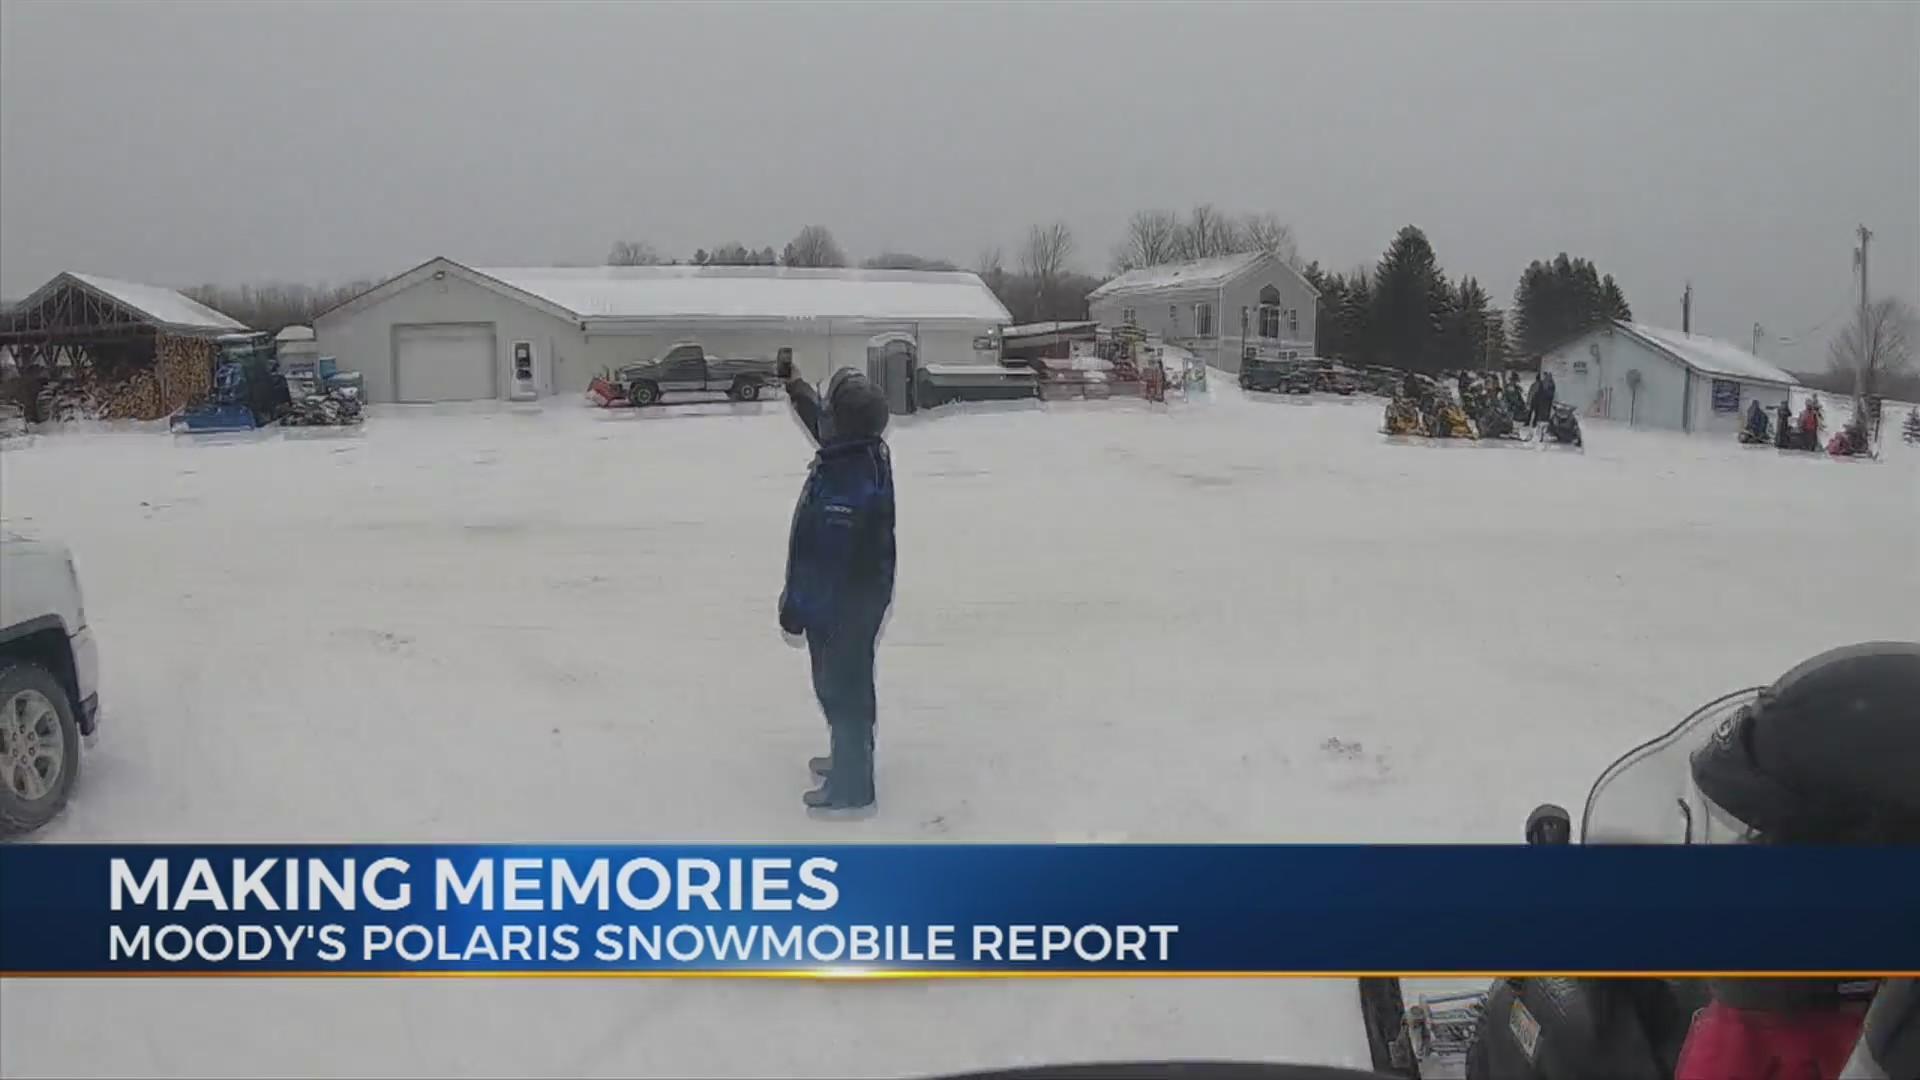 Moody's Polaris Snowmobile Report 3-14